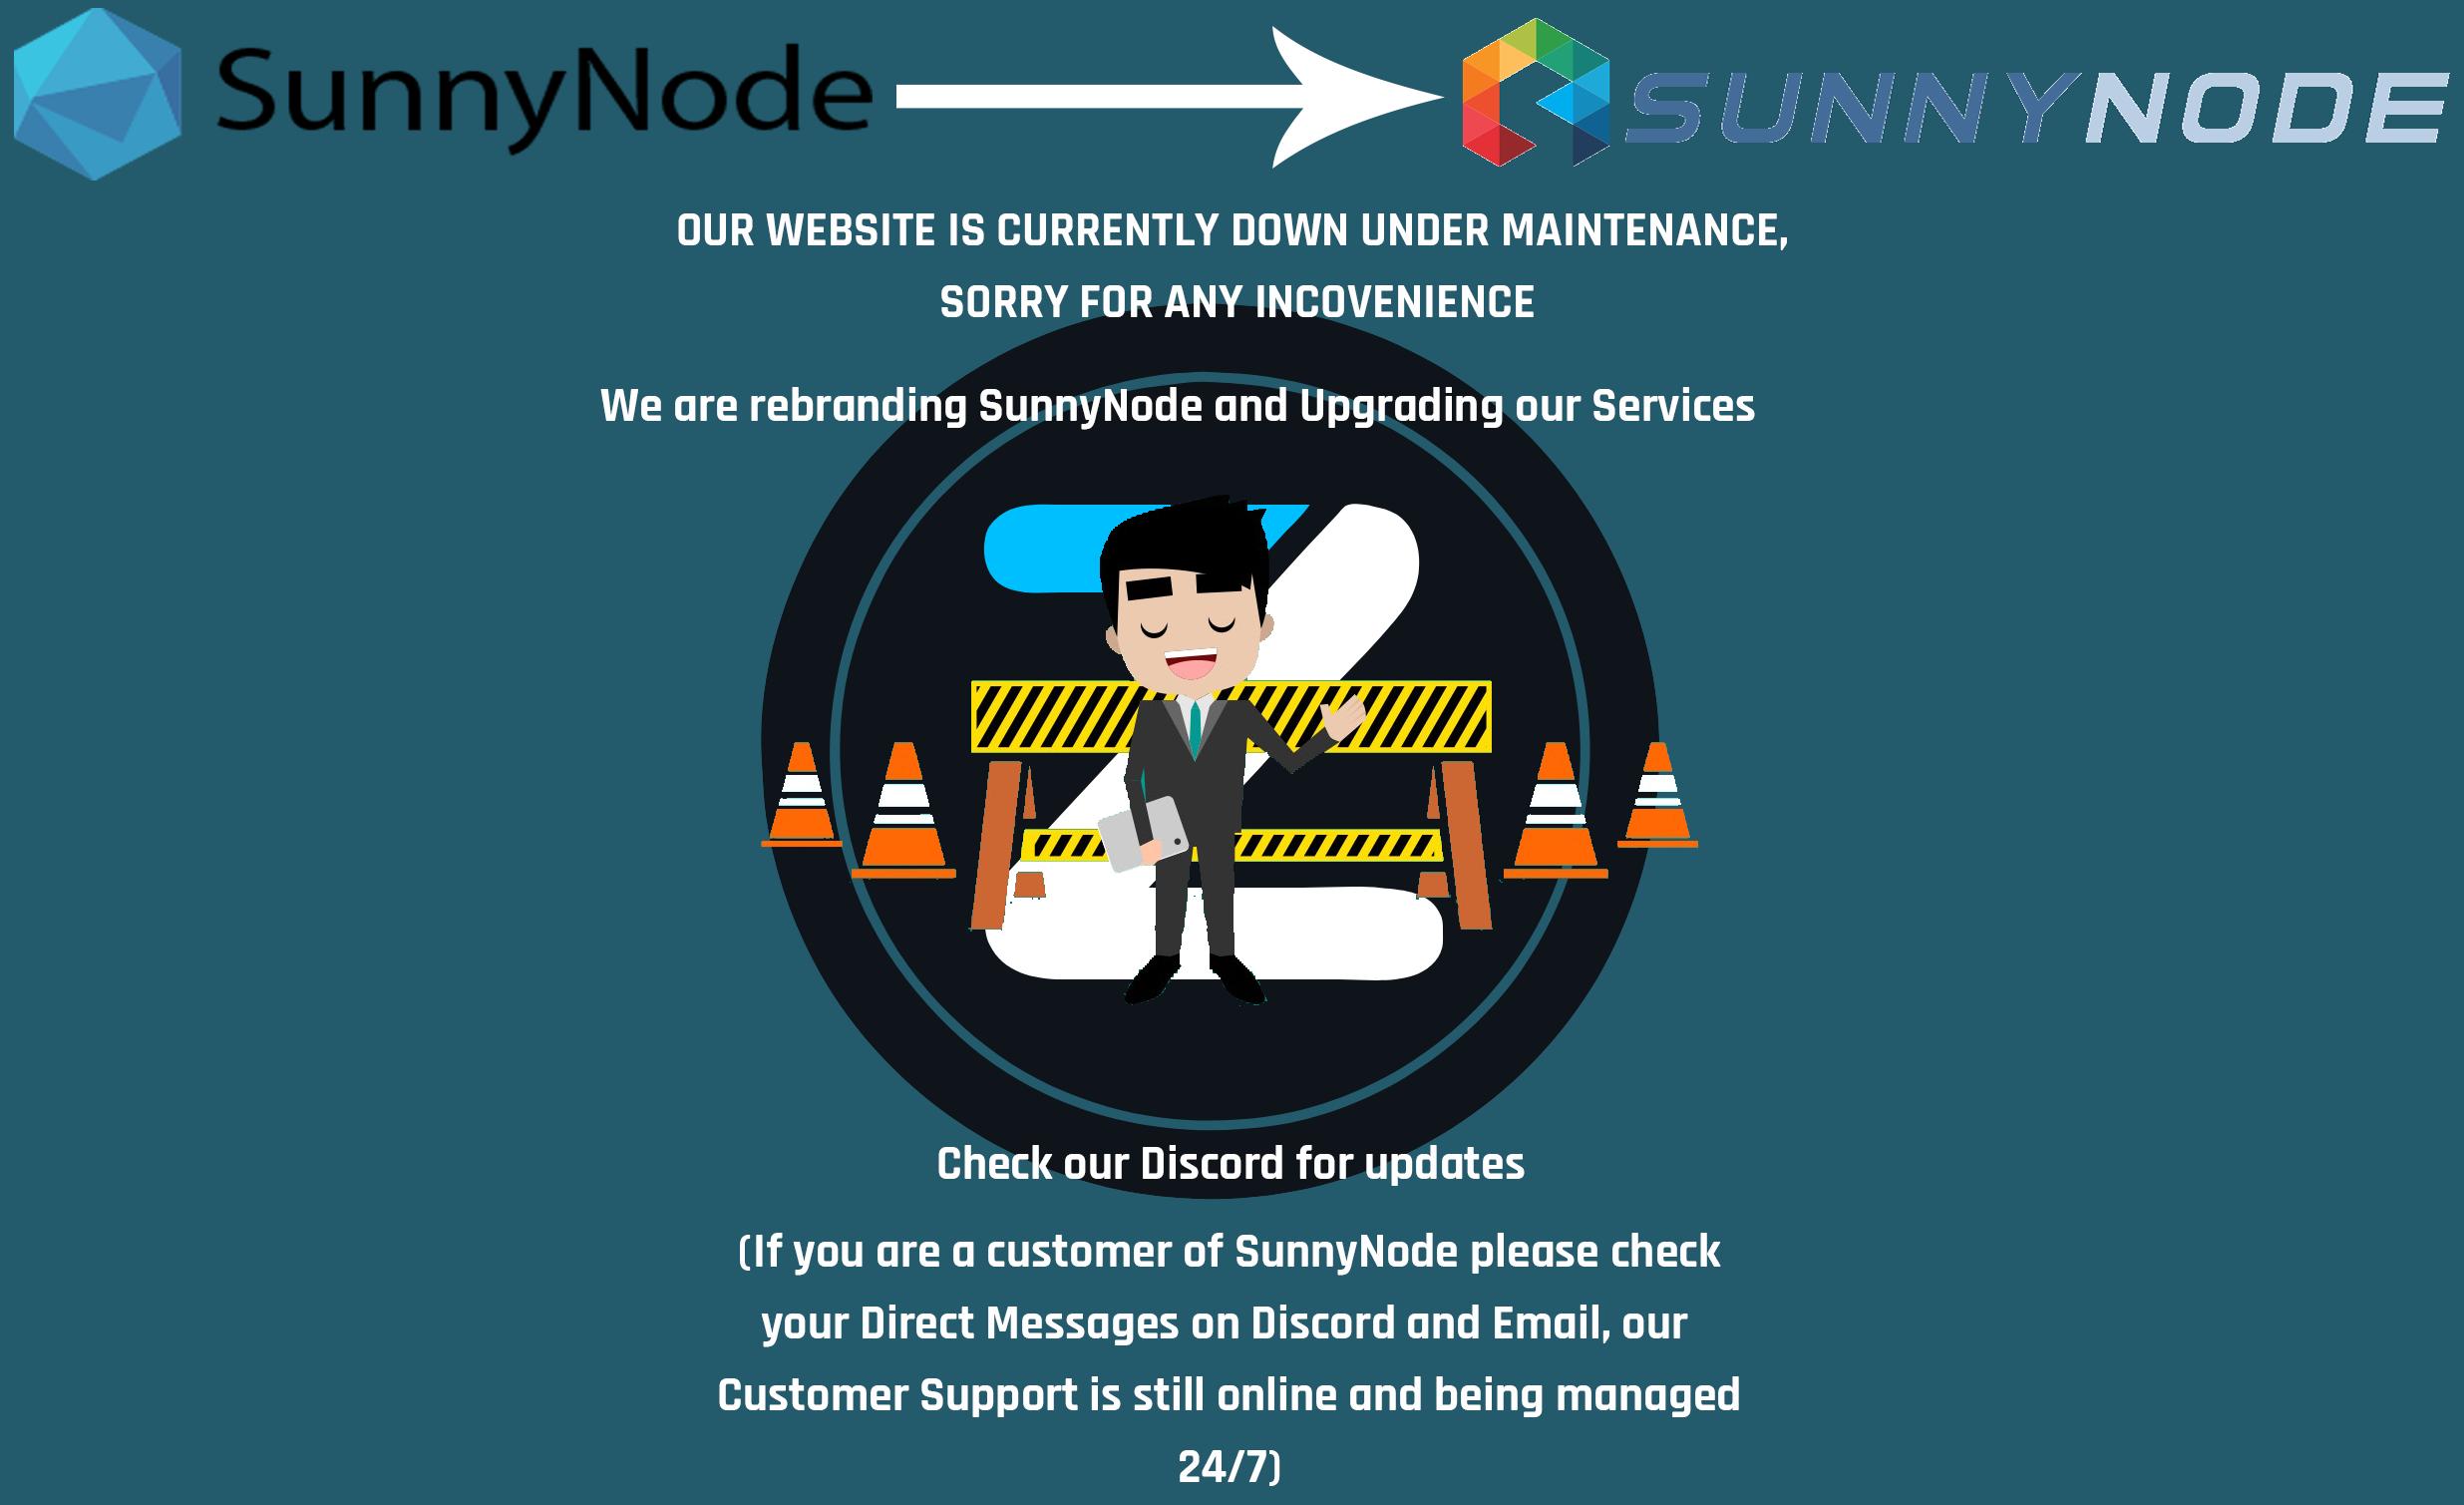 SunnyNode Maintenance